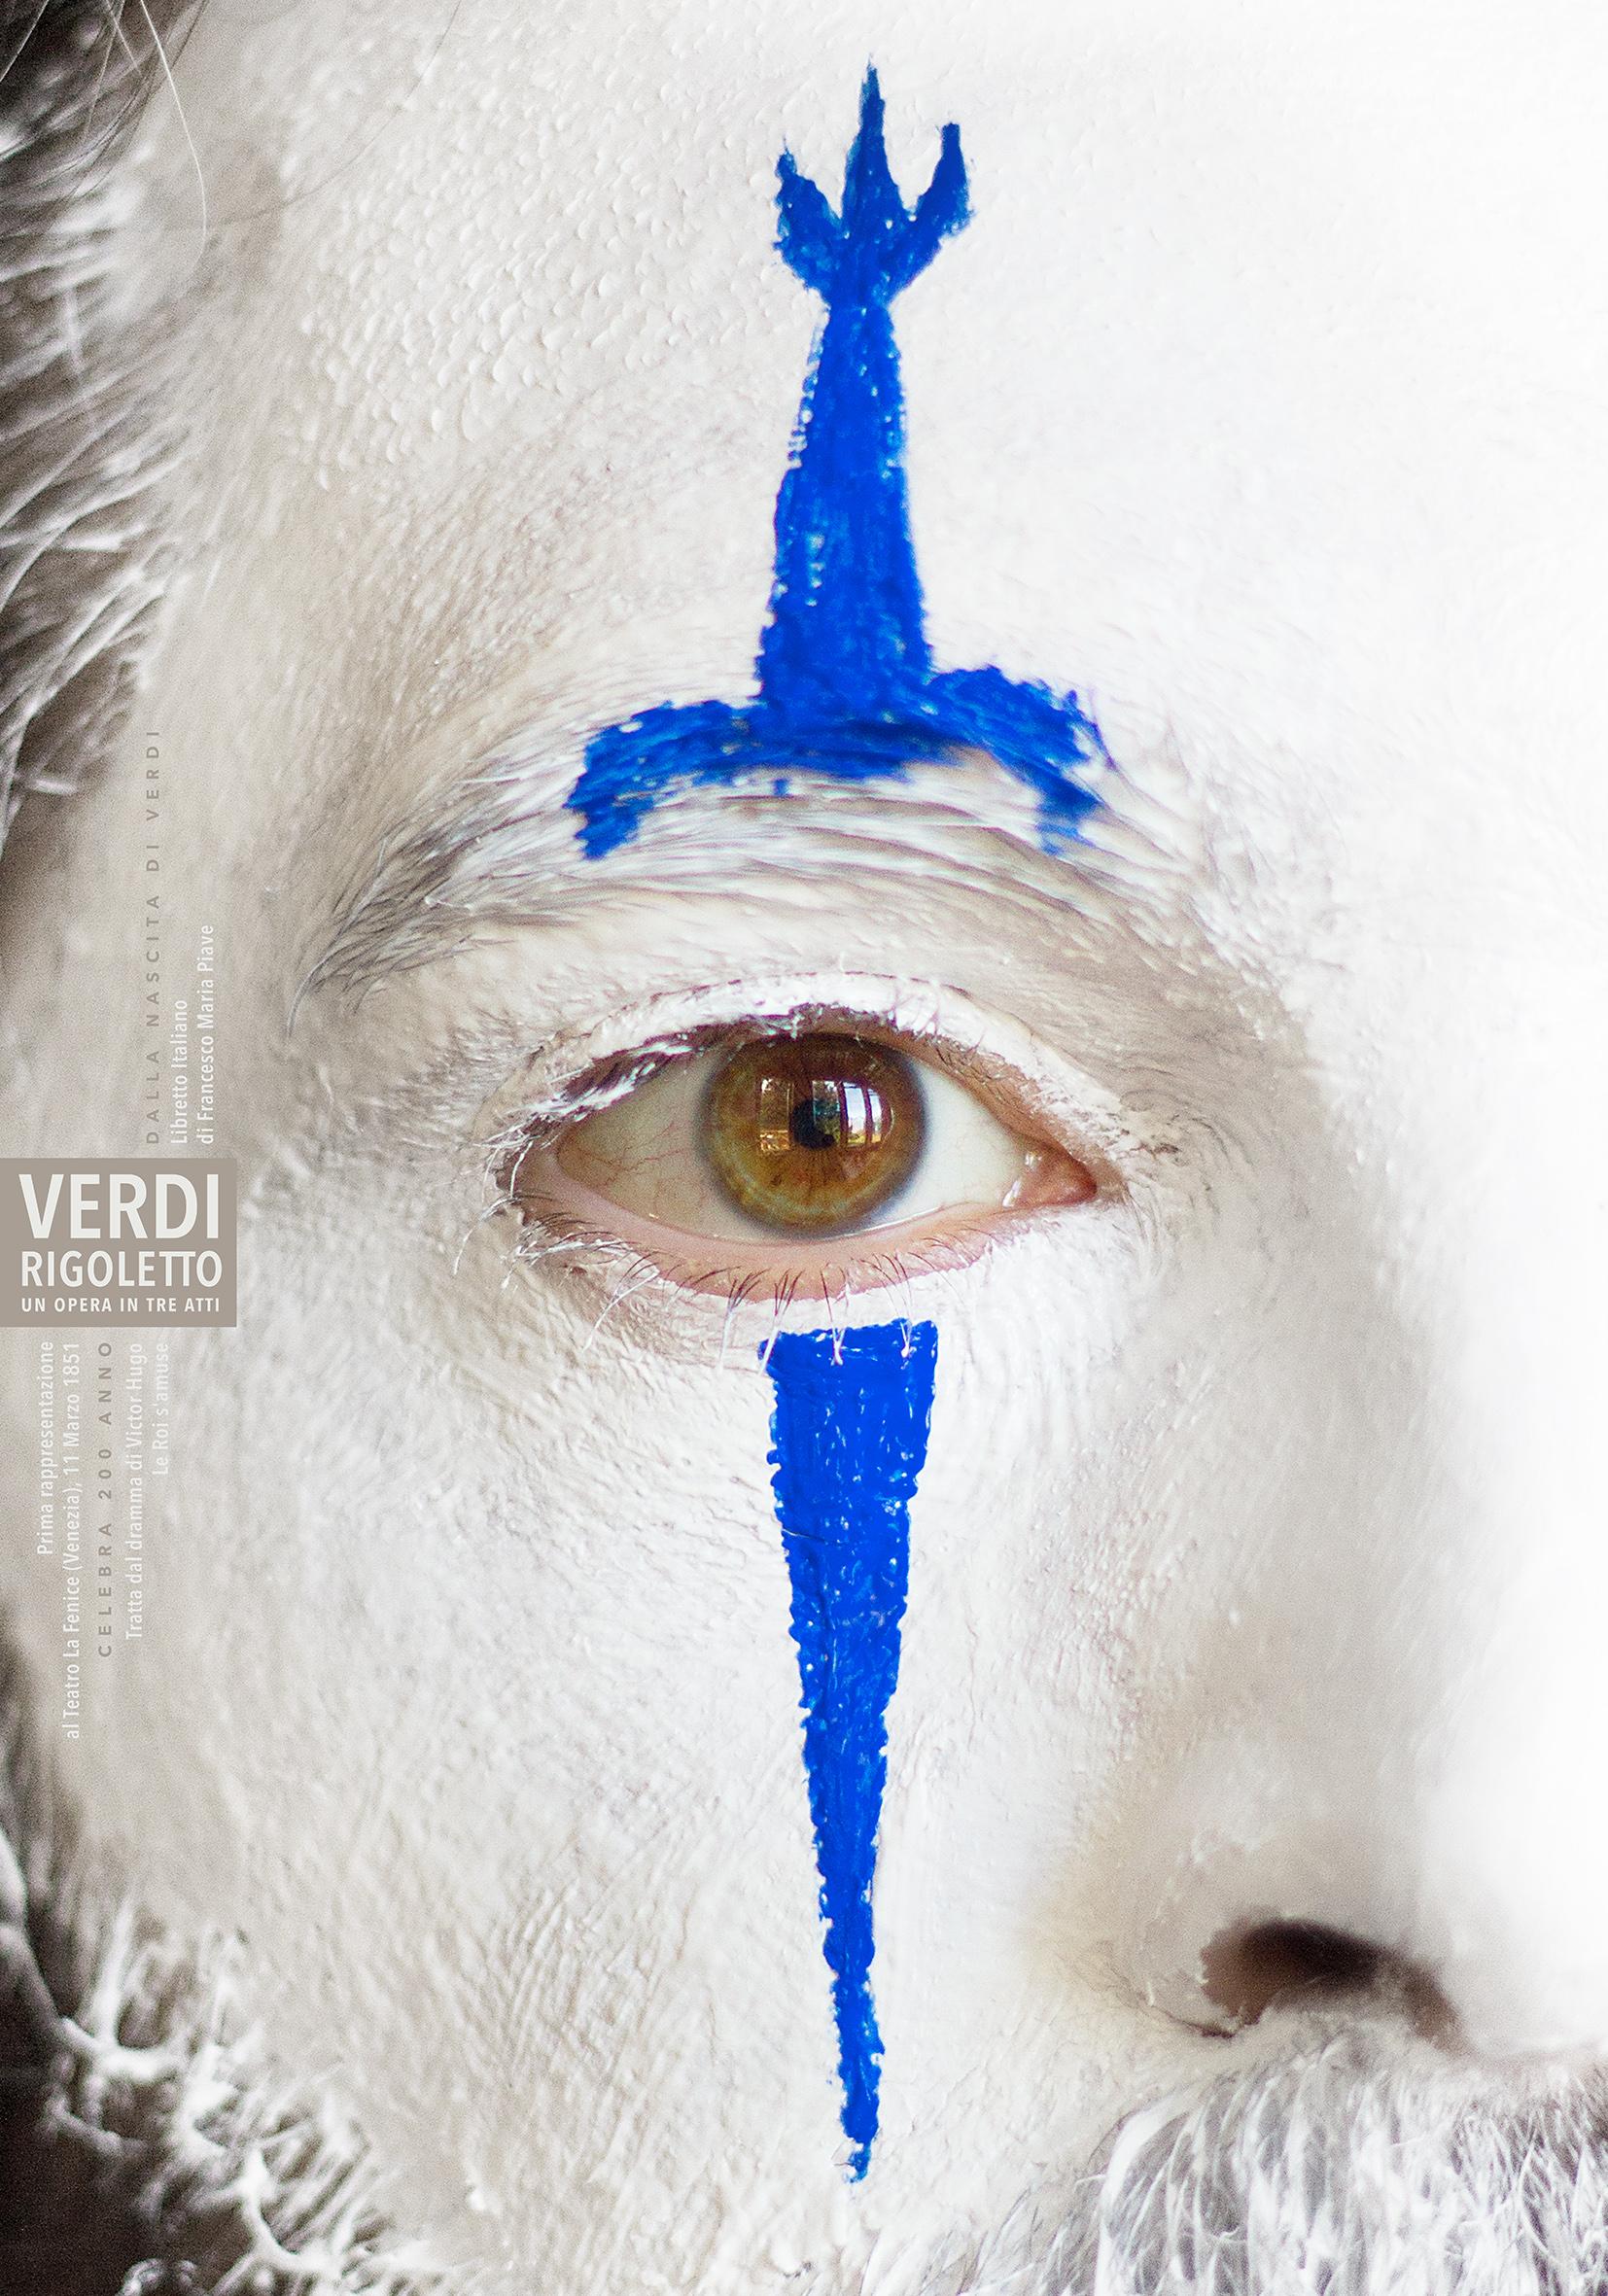 Warner-Daniel-Poster2-Verdi-Rigoletto.jpg